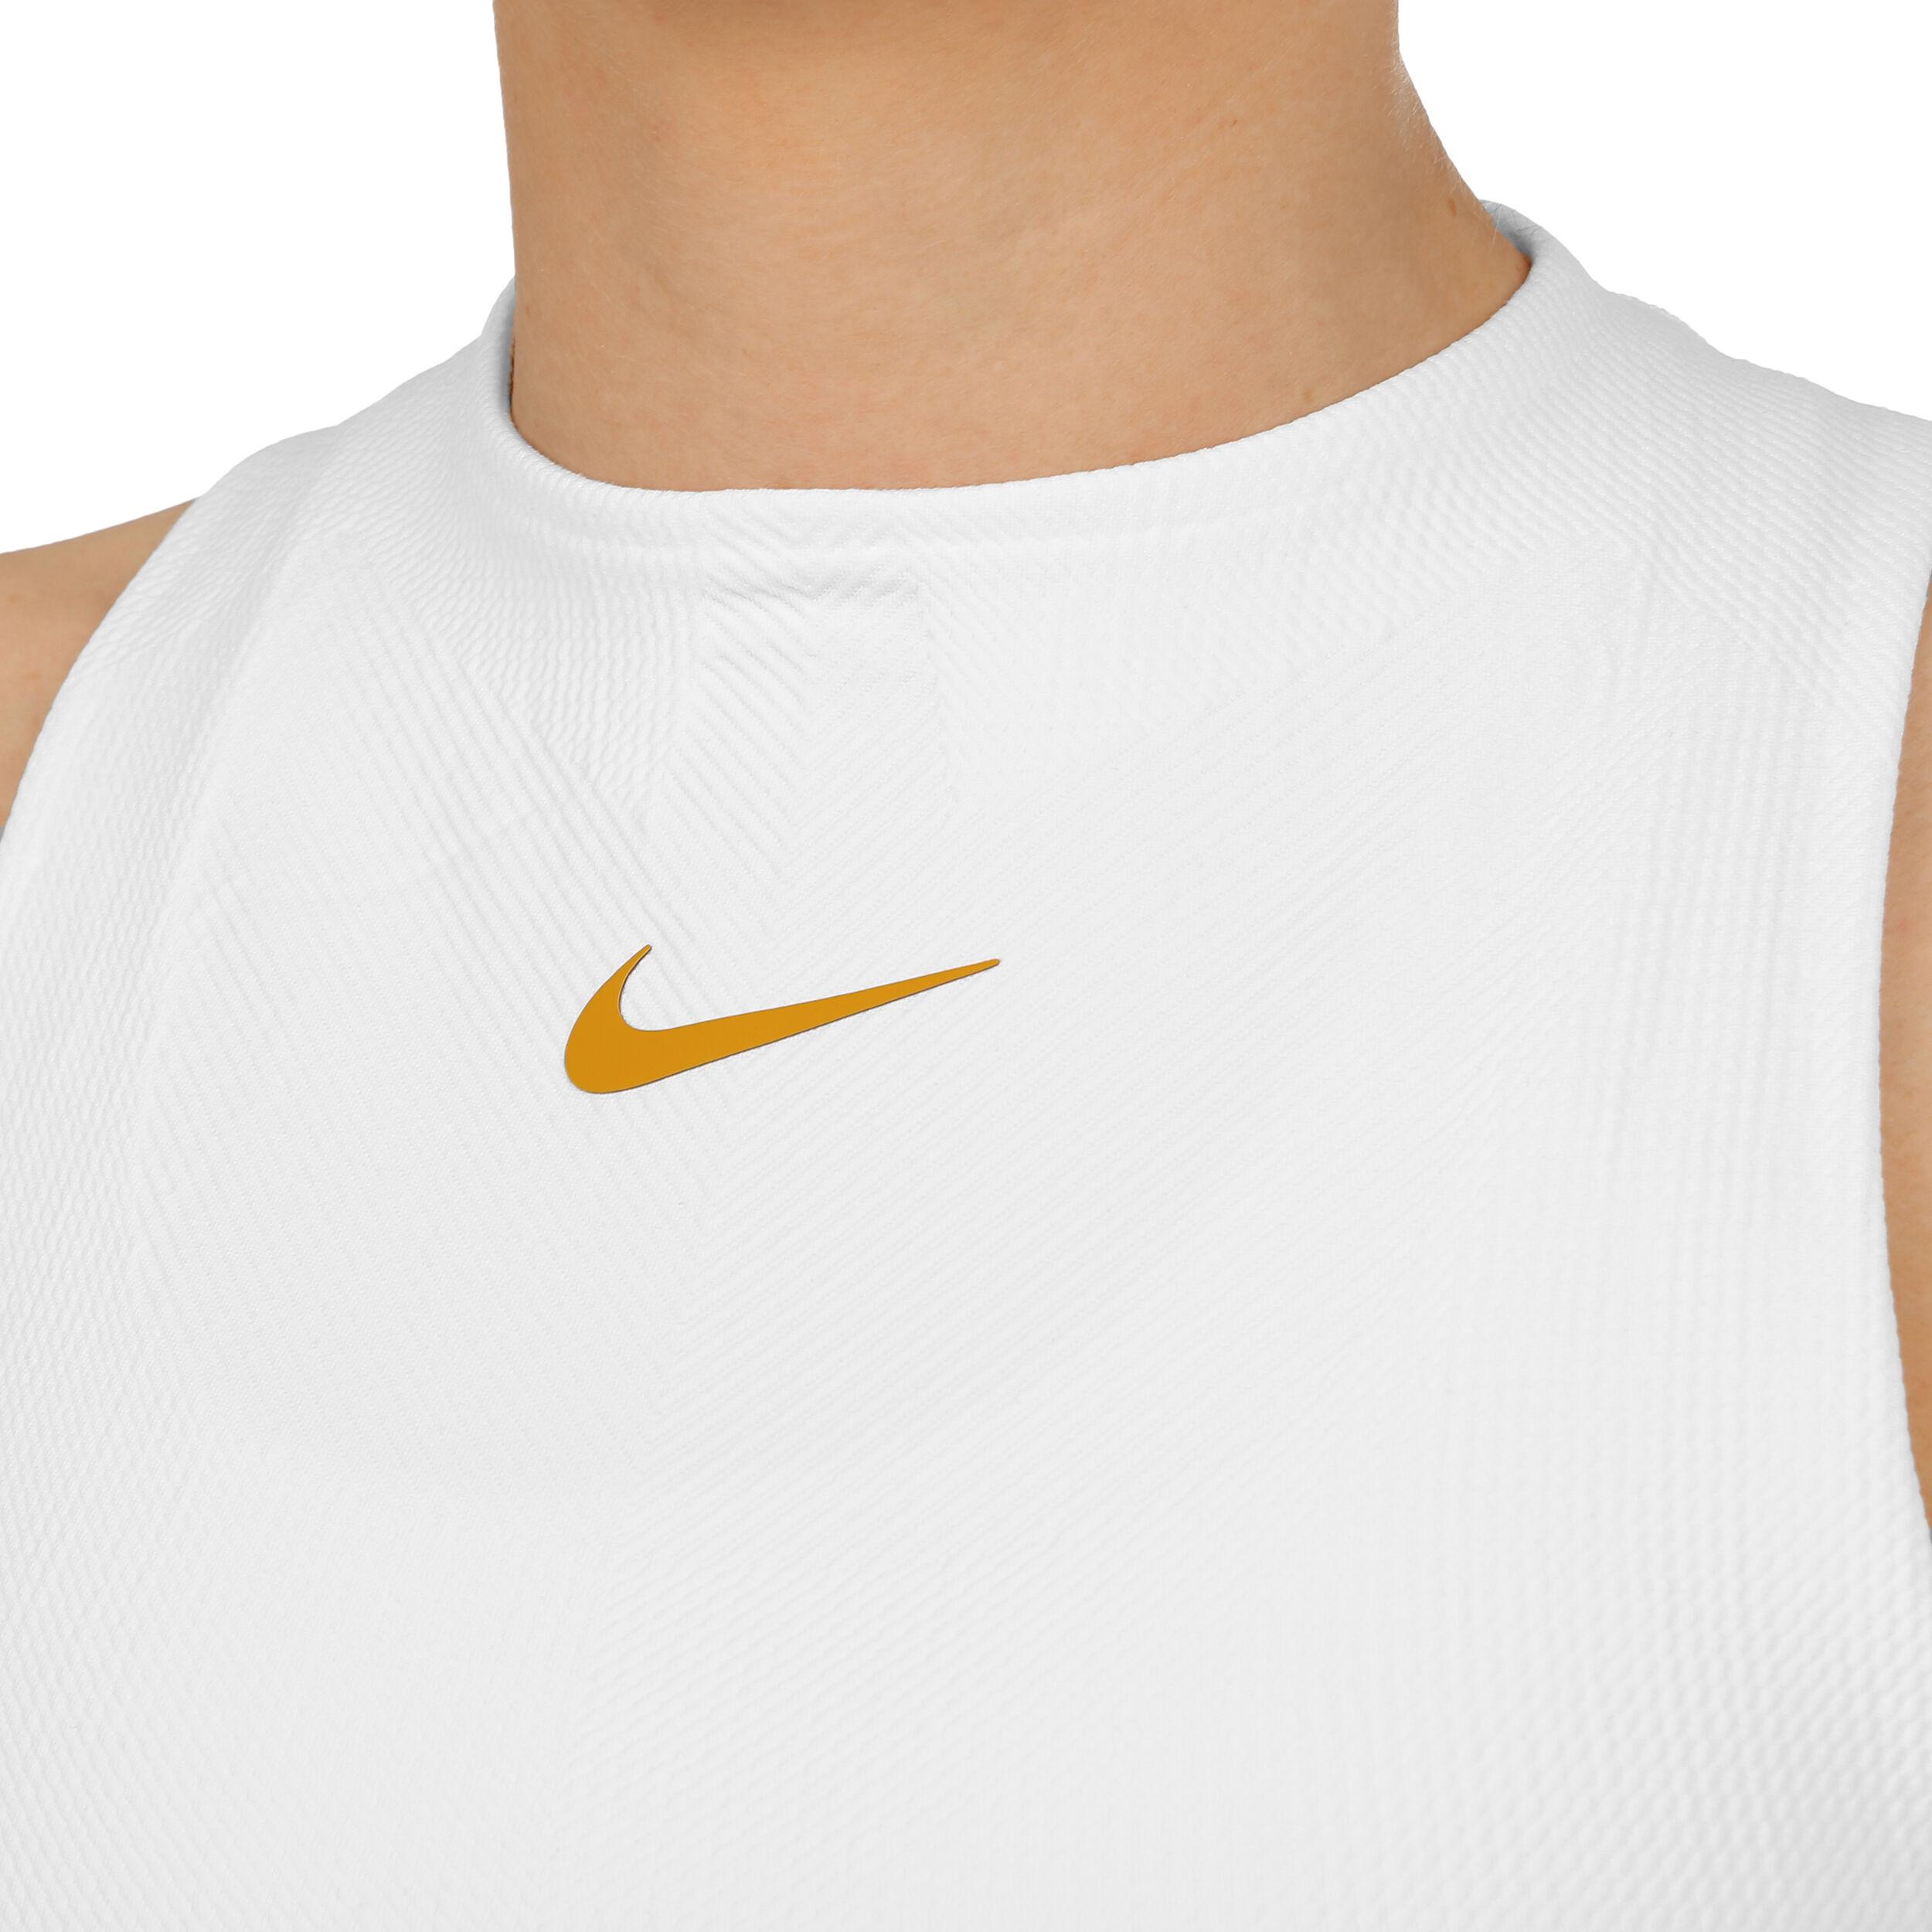 Nike Court Slam Camiseta De Tiras Mujeres Blanco, Amarillo